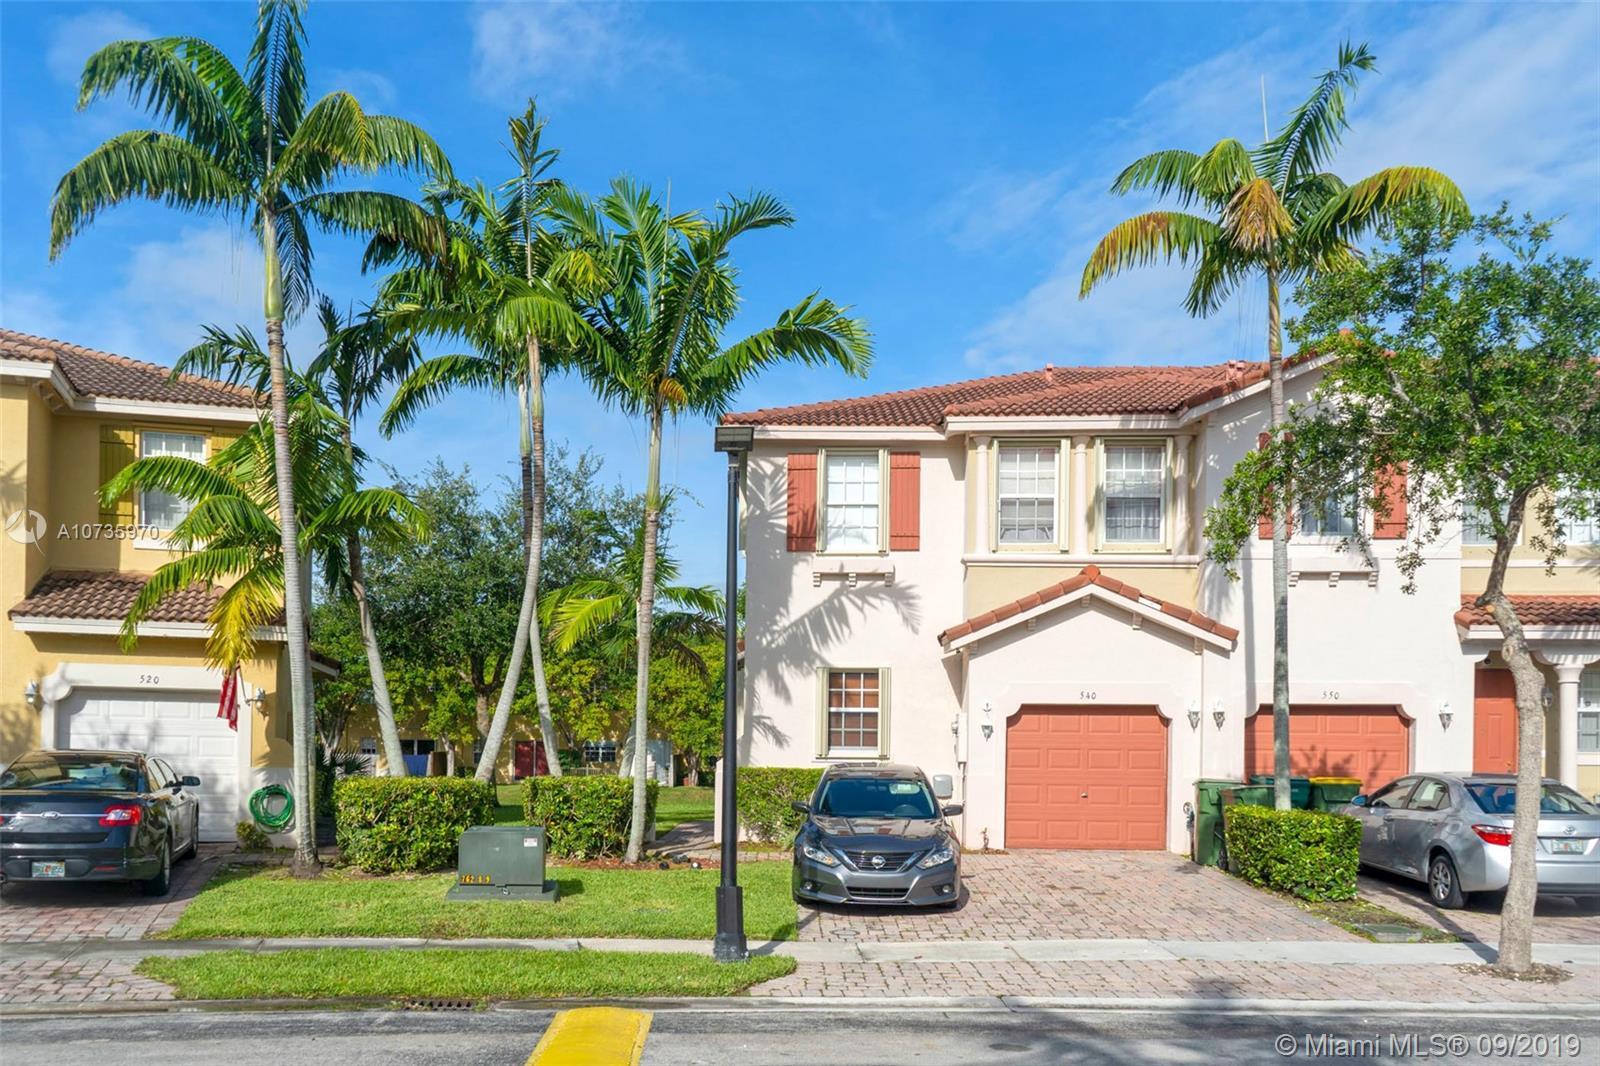 540 NE 21st Ter, Homestead, FL 33033 - Homestead, FL real estate listing